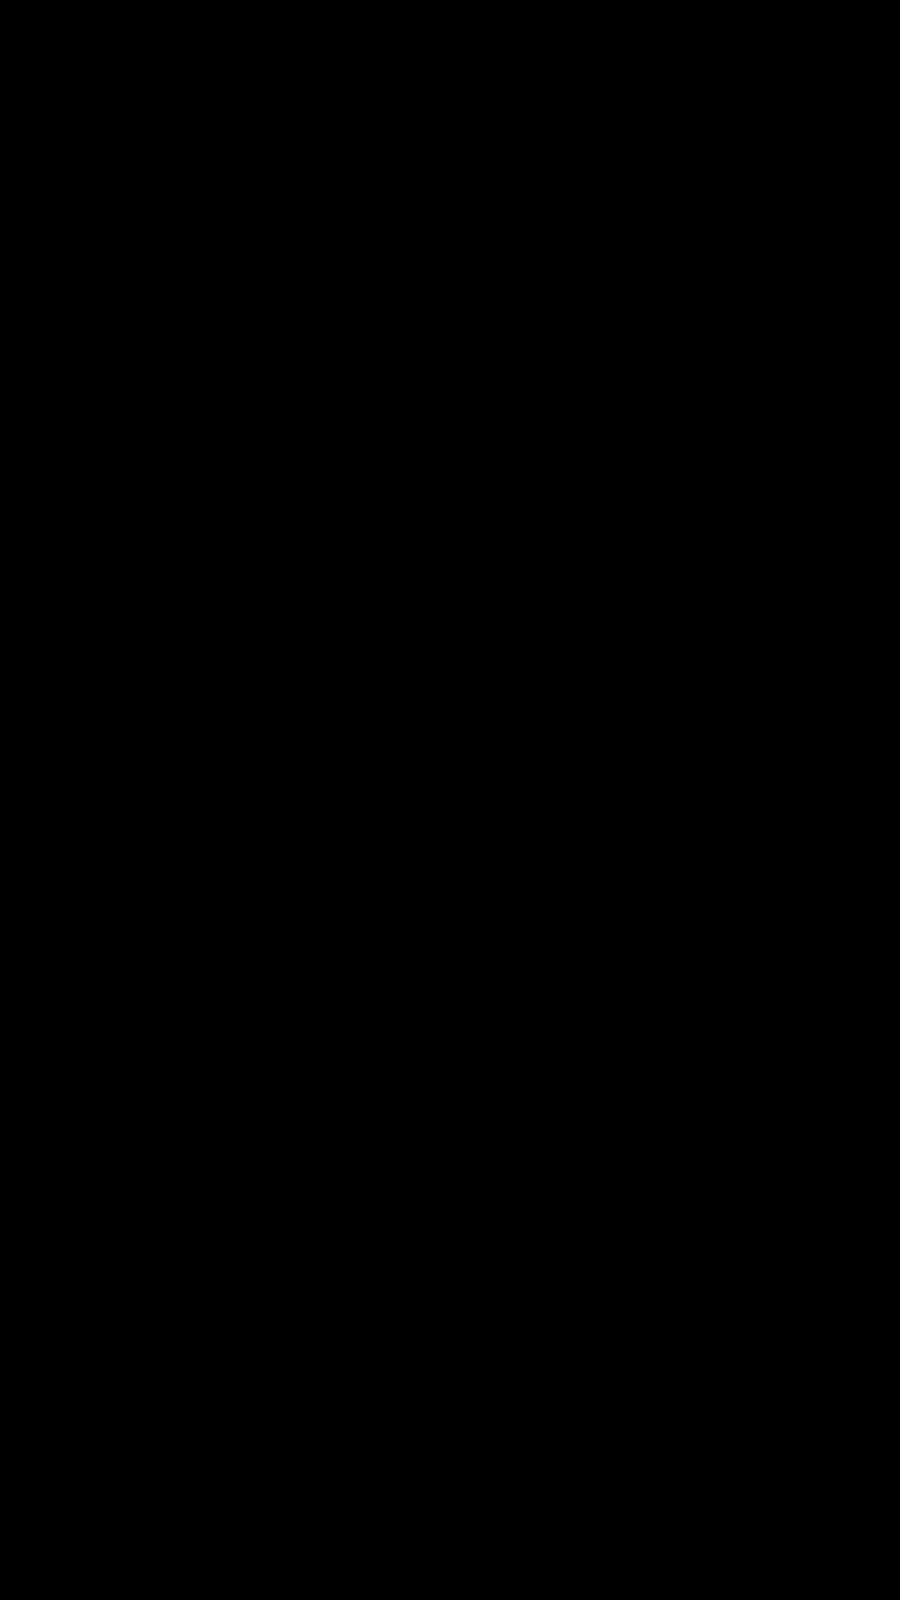 69 Black Android Wallpapers On Wallpapersafari